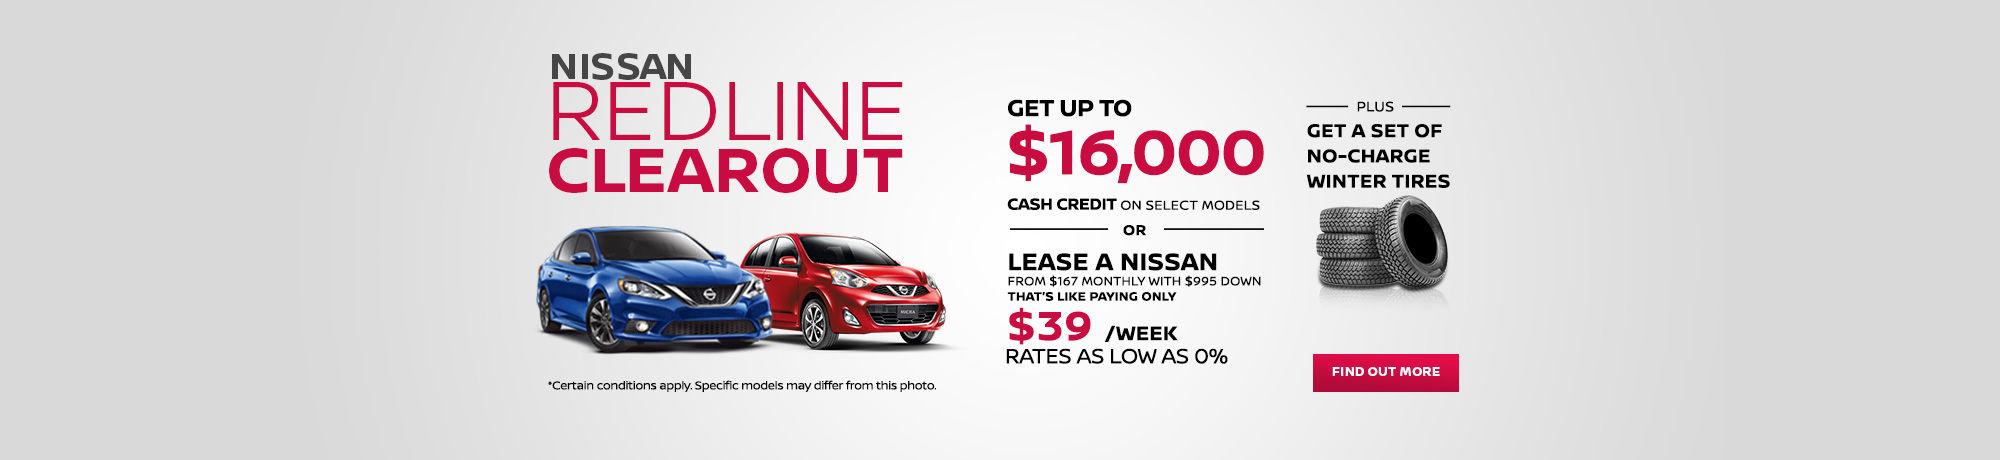 Nissan Redline Clearout - October